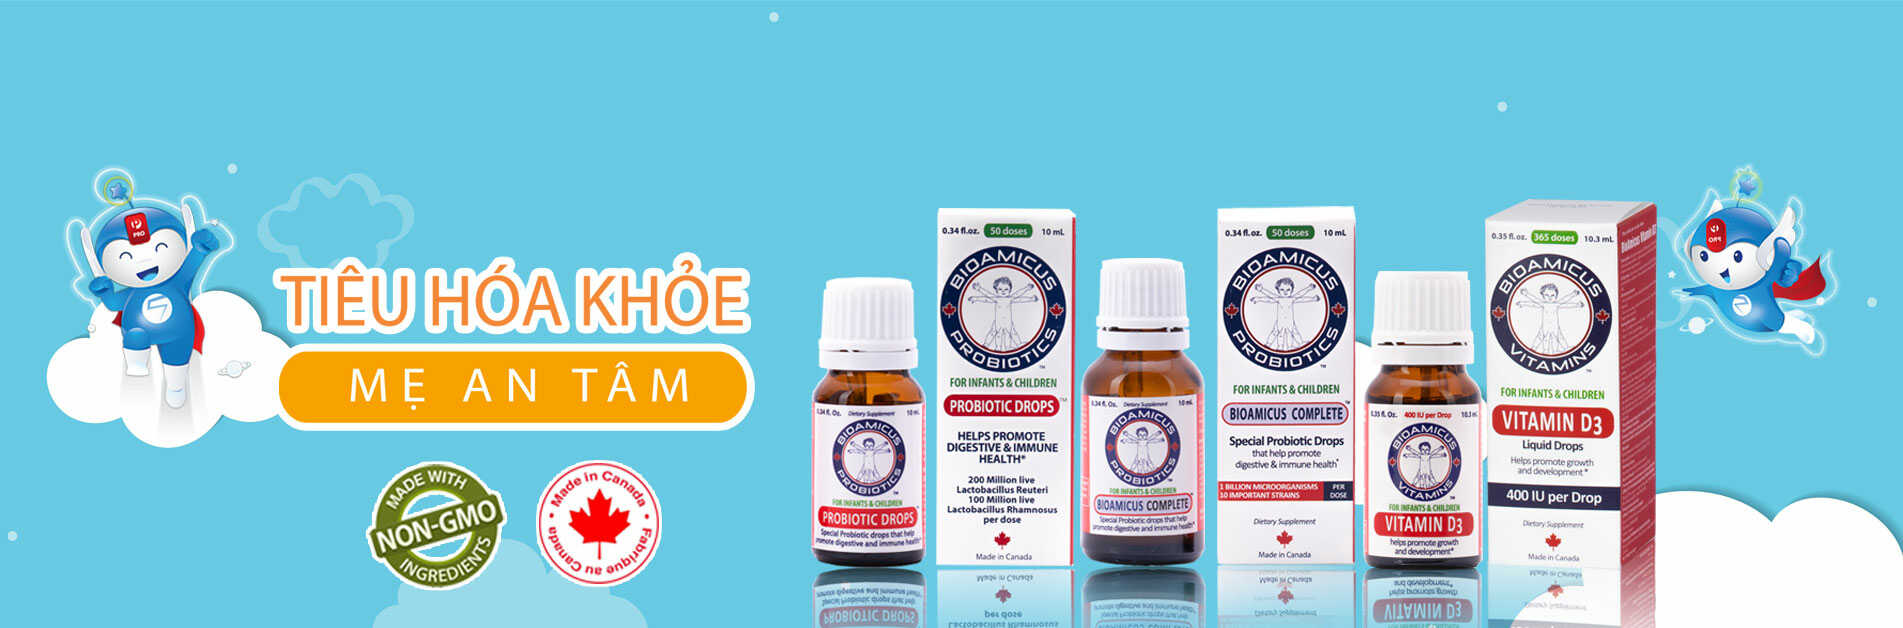 men vi sinh và vitamin Bioamicus Việt Nam